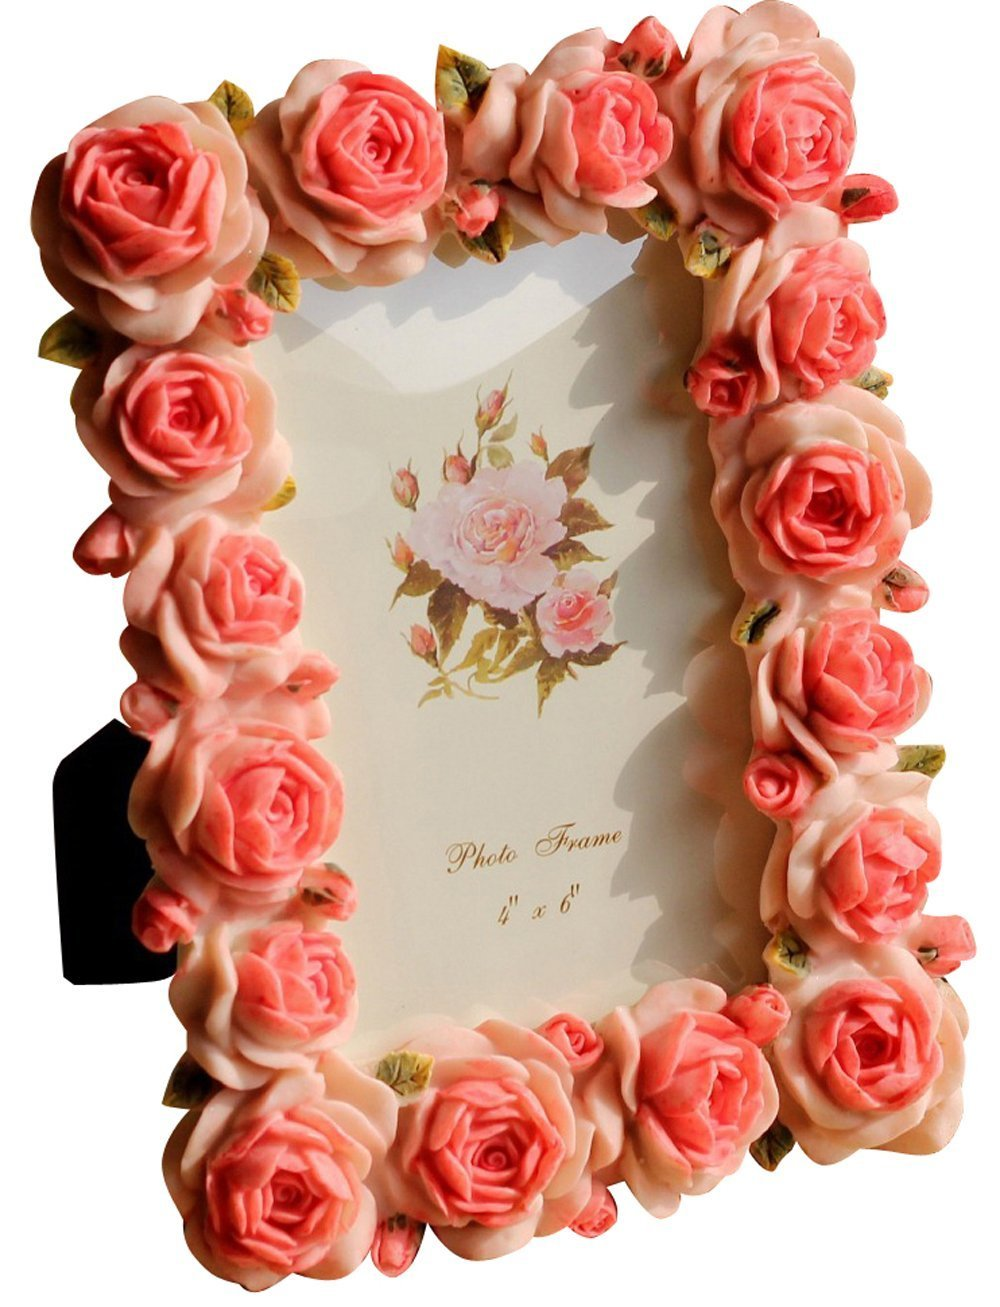 Amazon.de: Giftgarden Bilderrahmen 10 x 15 cm Rot mit blühenden ...